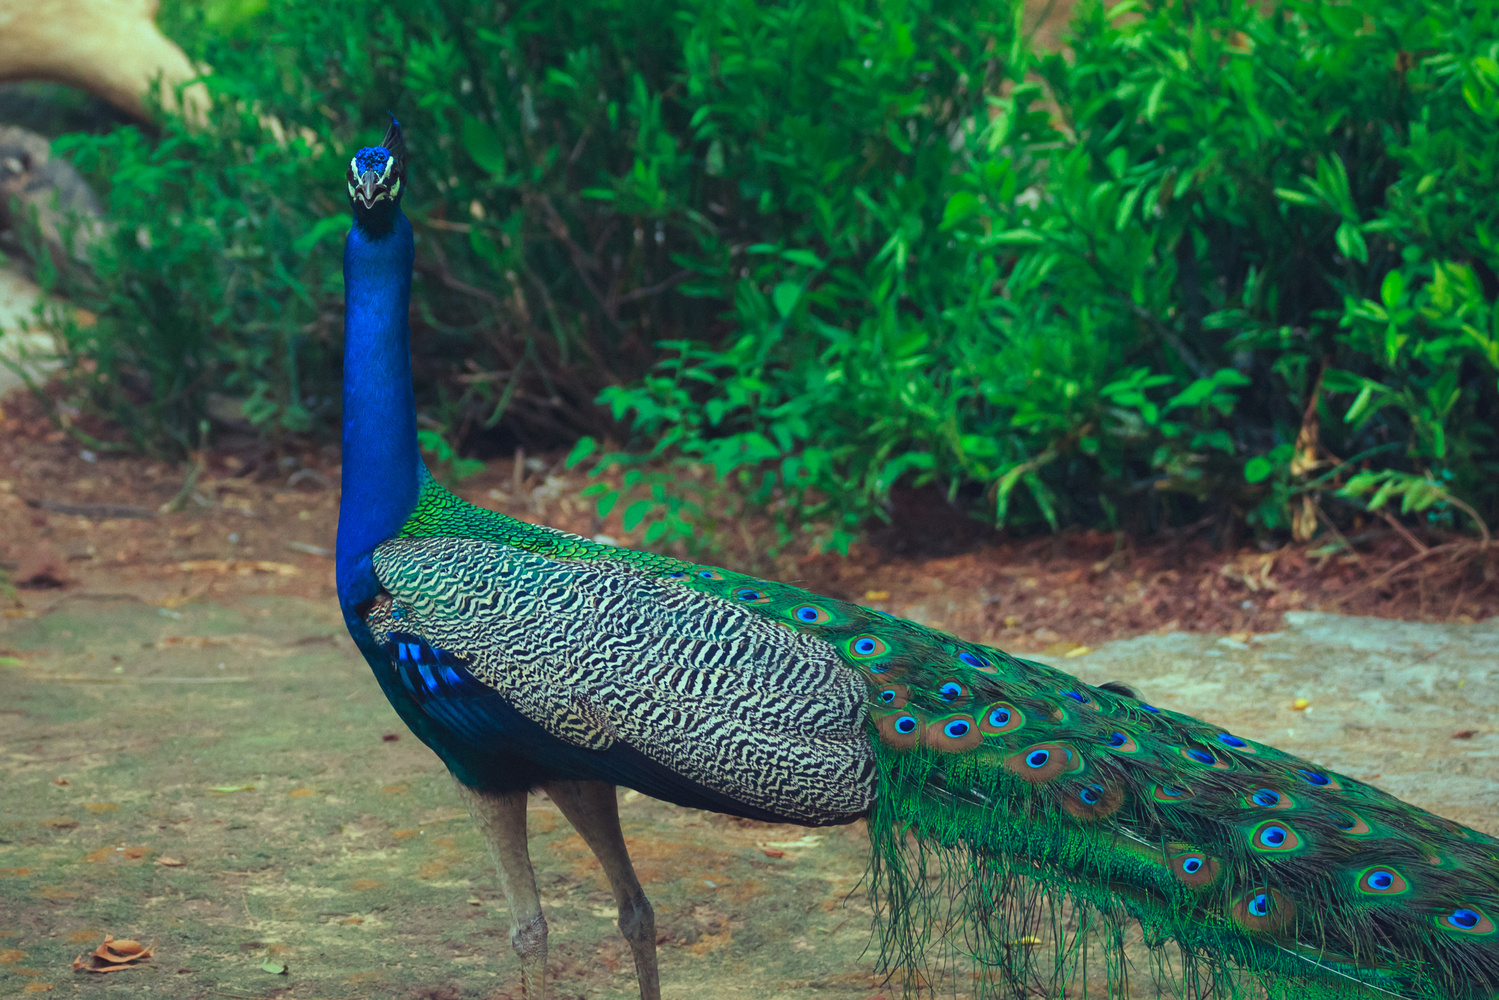 Angry Peacock by Vivek Doshi